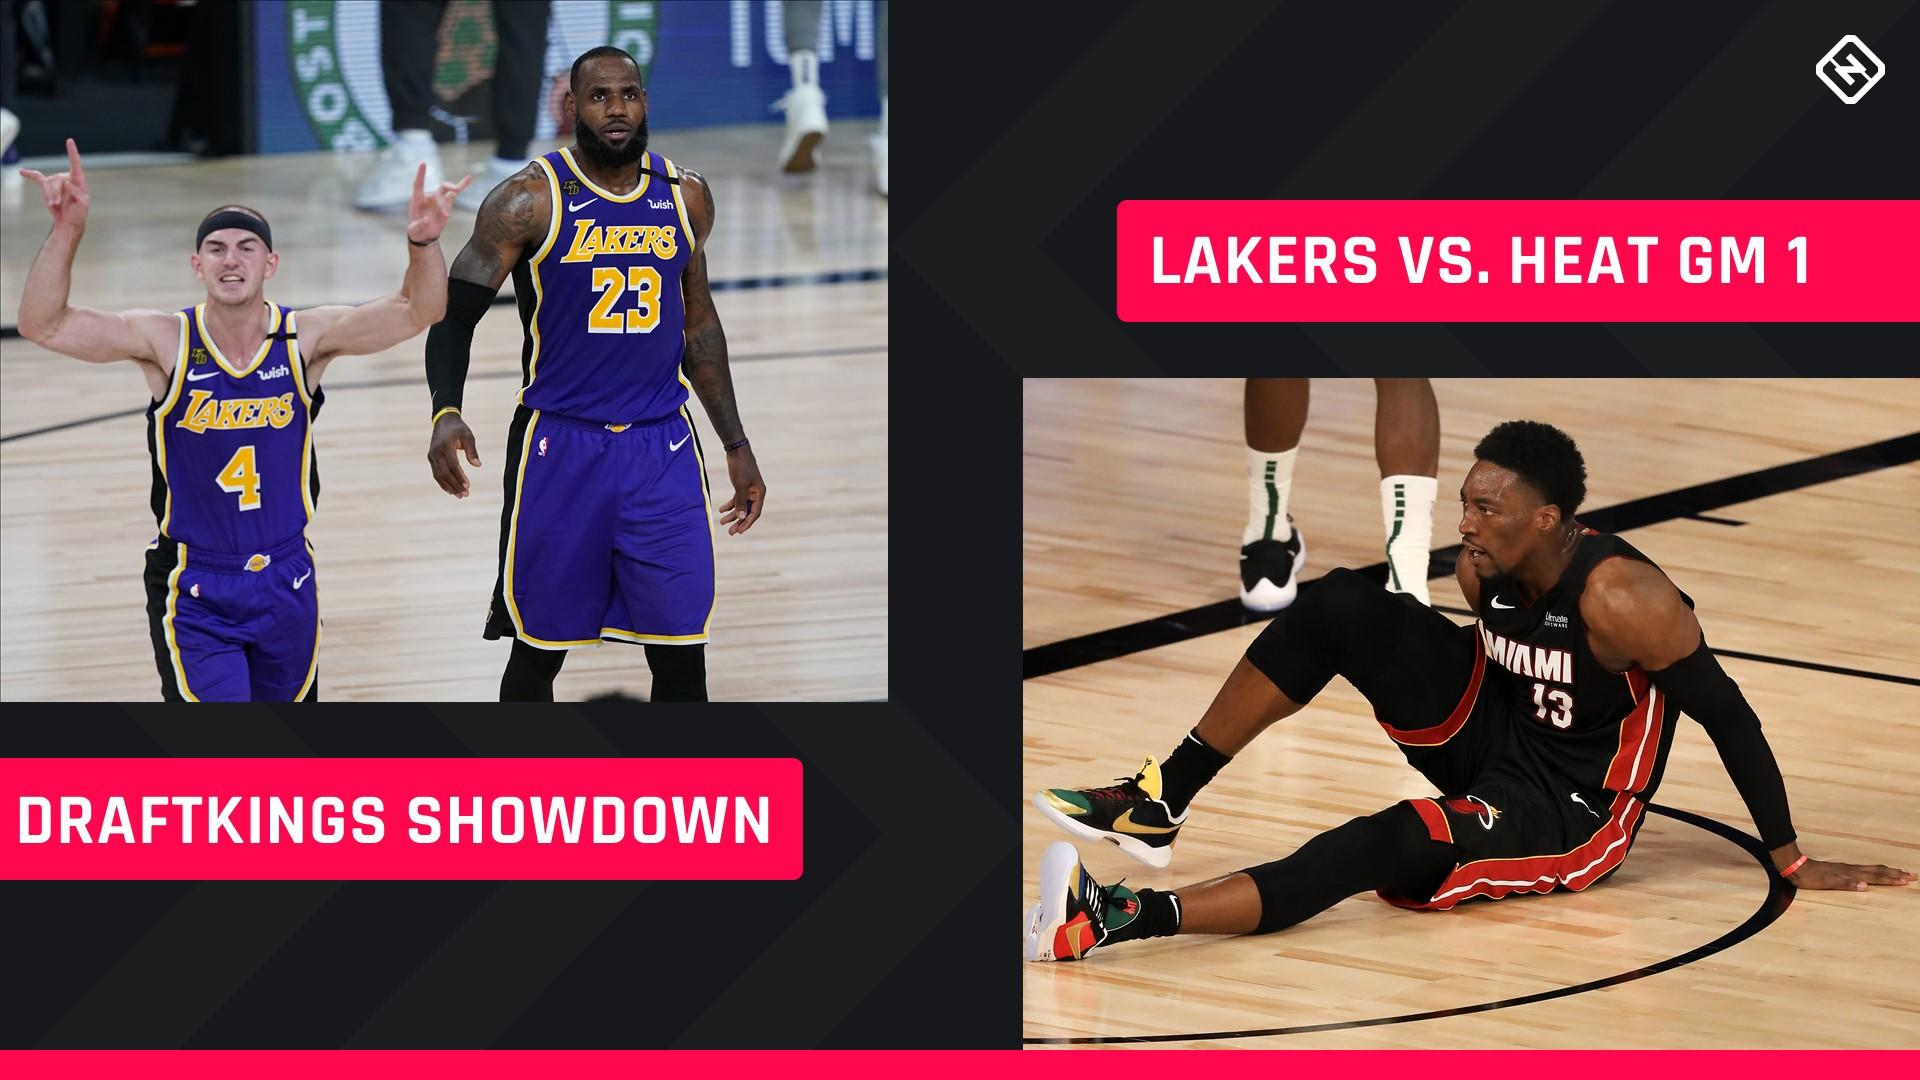 Nba Finals Draftkings Picks Nba Dfs Lineup Advice For Game 1 Lakers Heat Showdown Tournaments